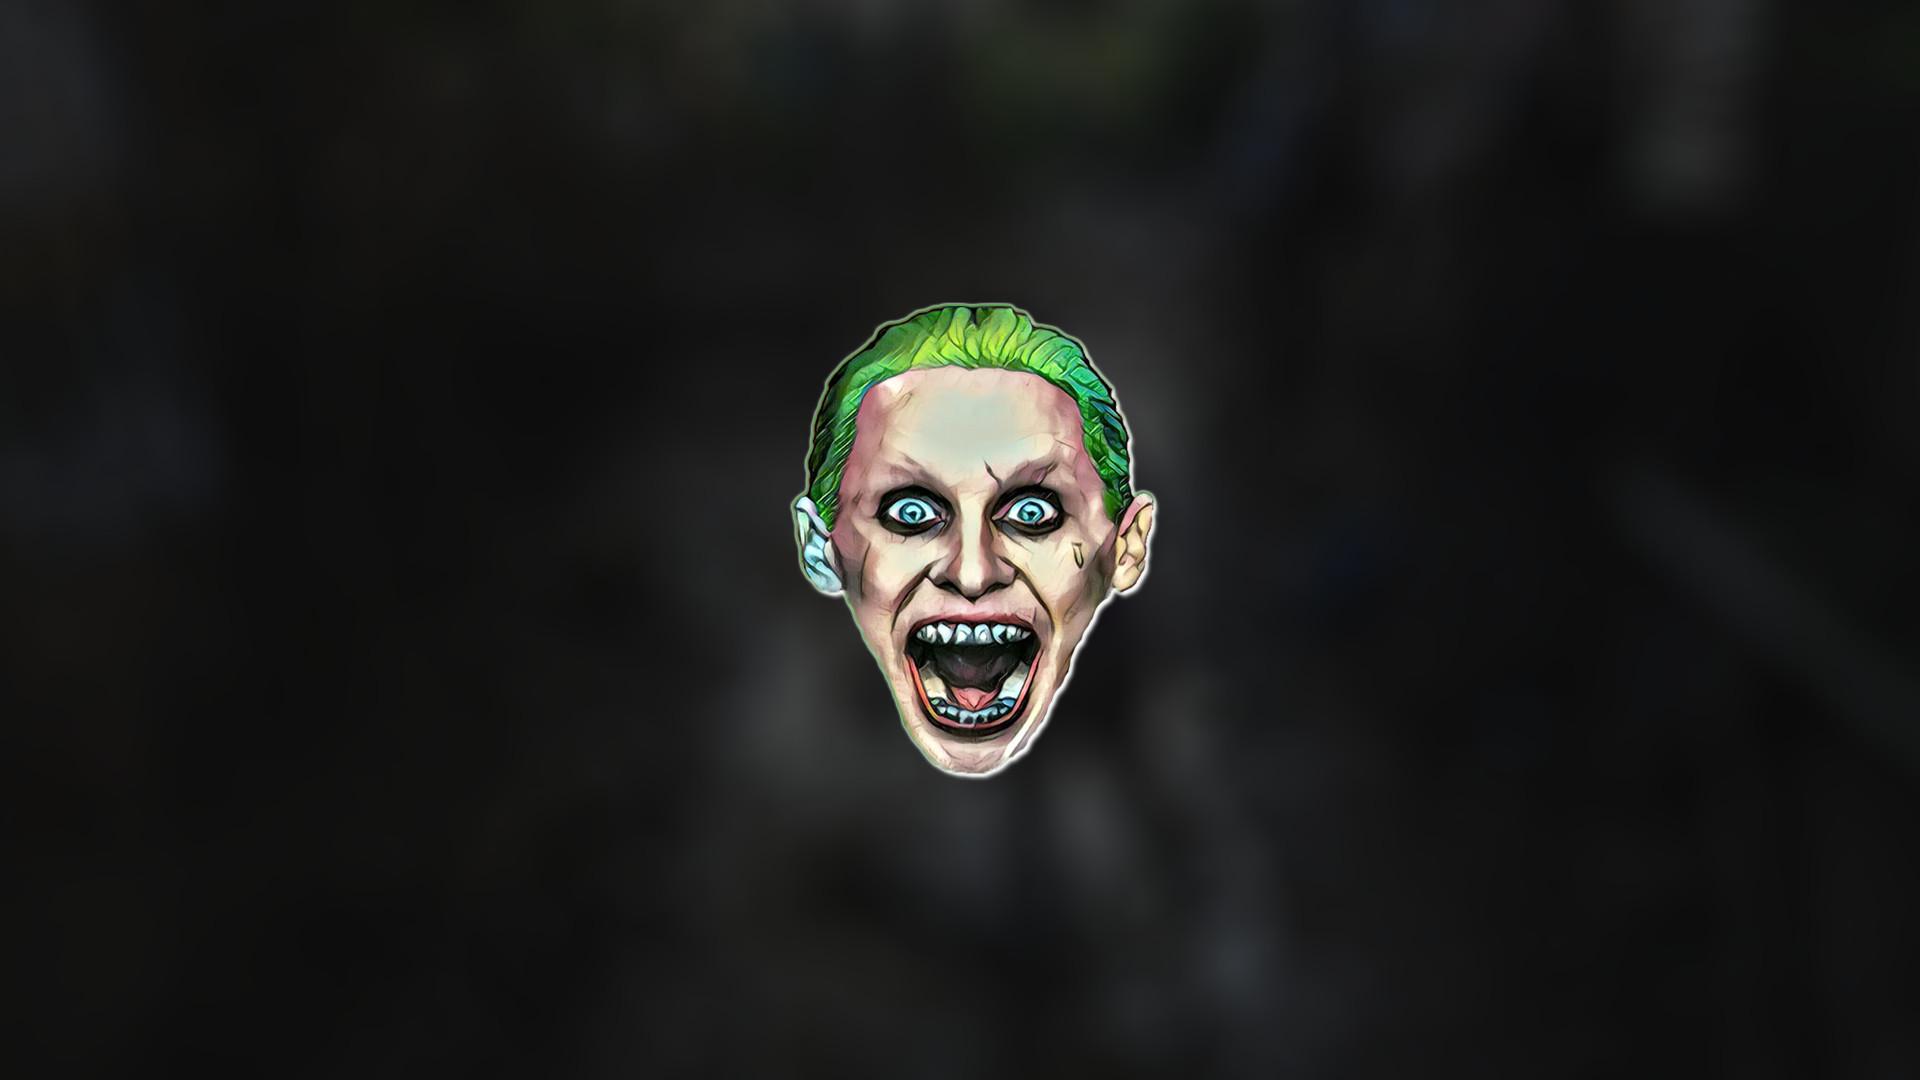 General Joker DC Comics Suicide Squad